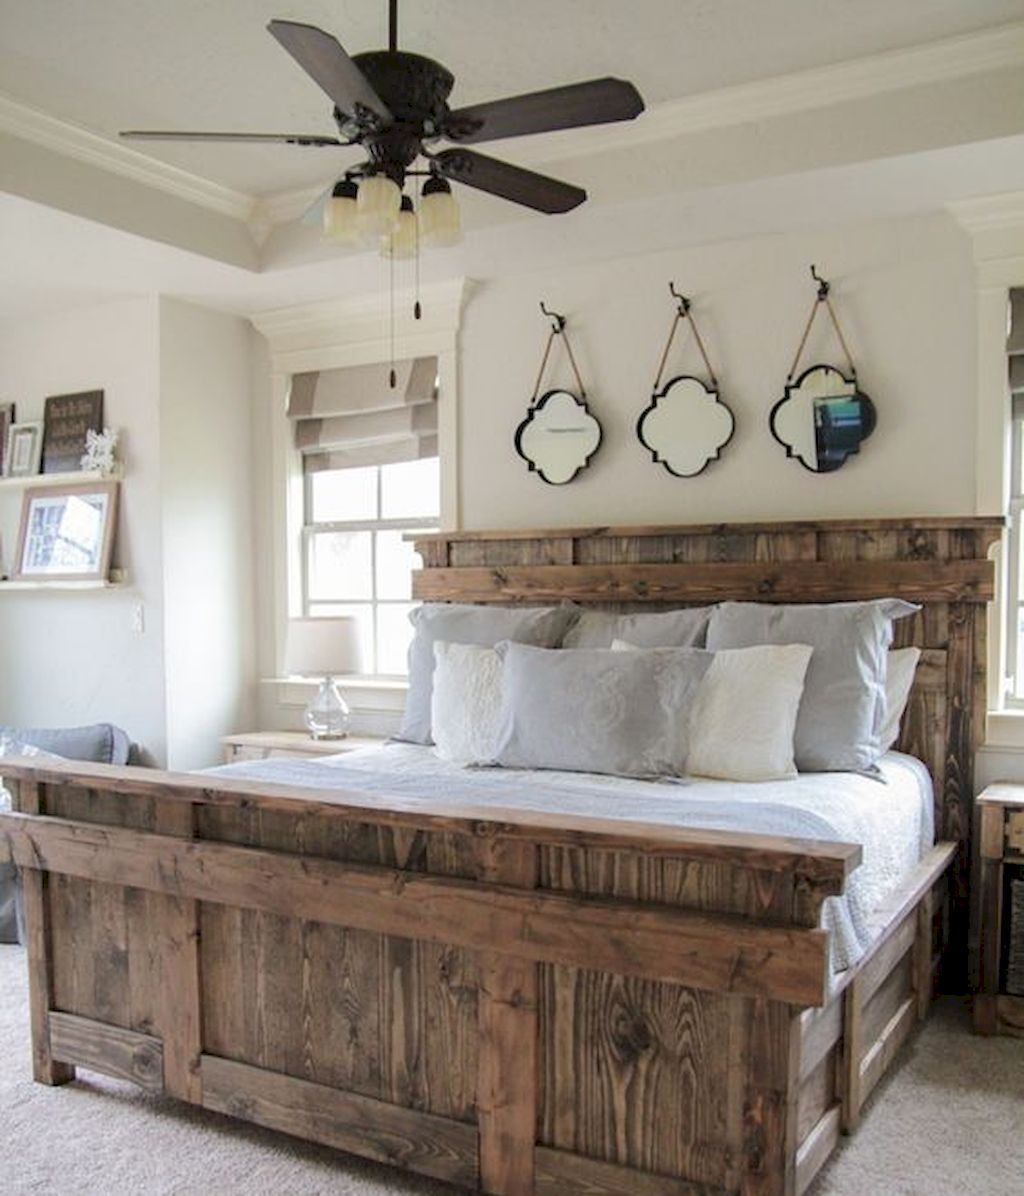 60 cozy farmhouse bedroom design decor ideas farmhouse